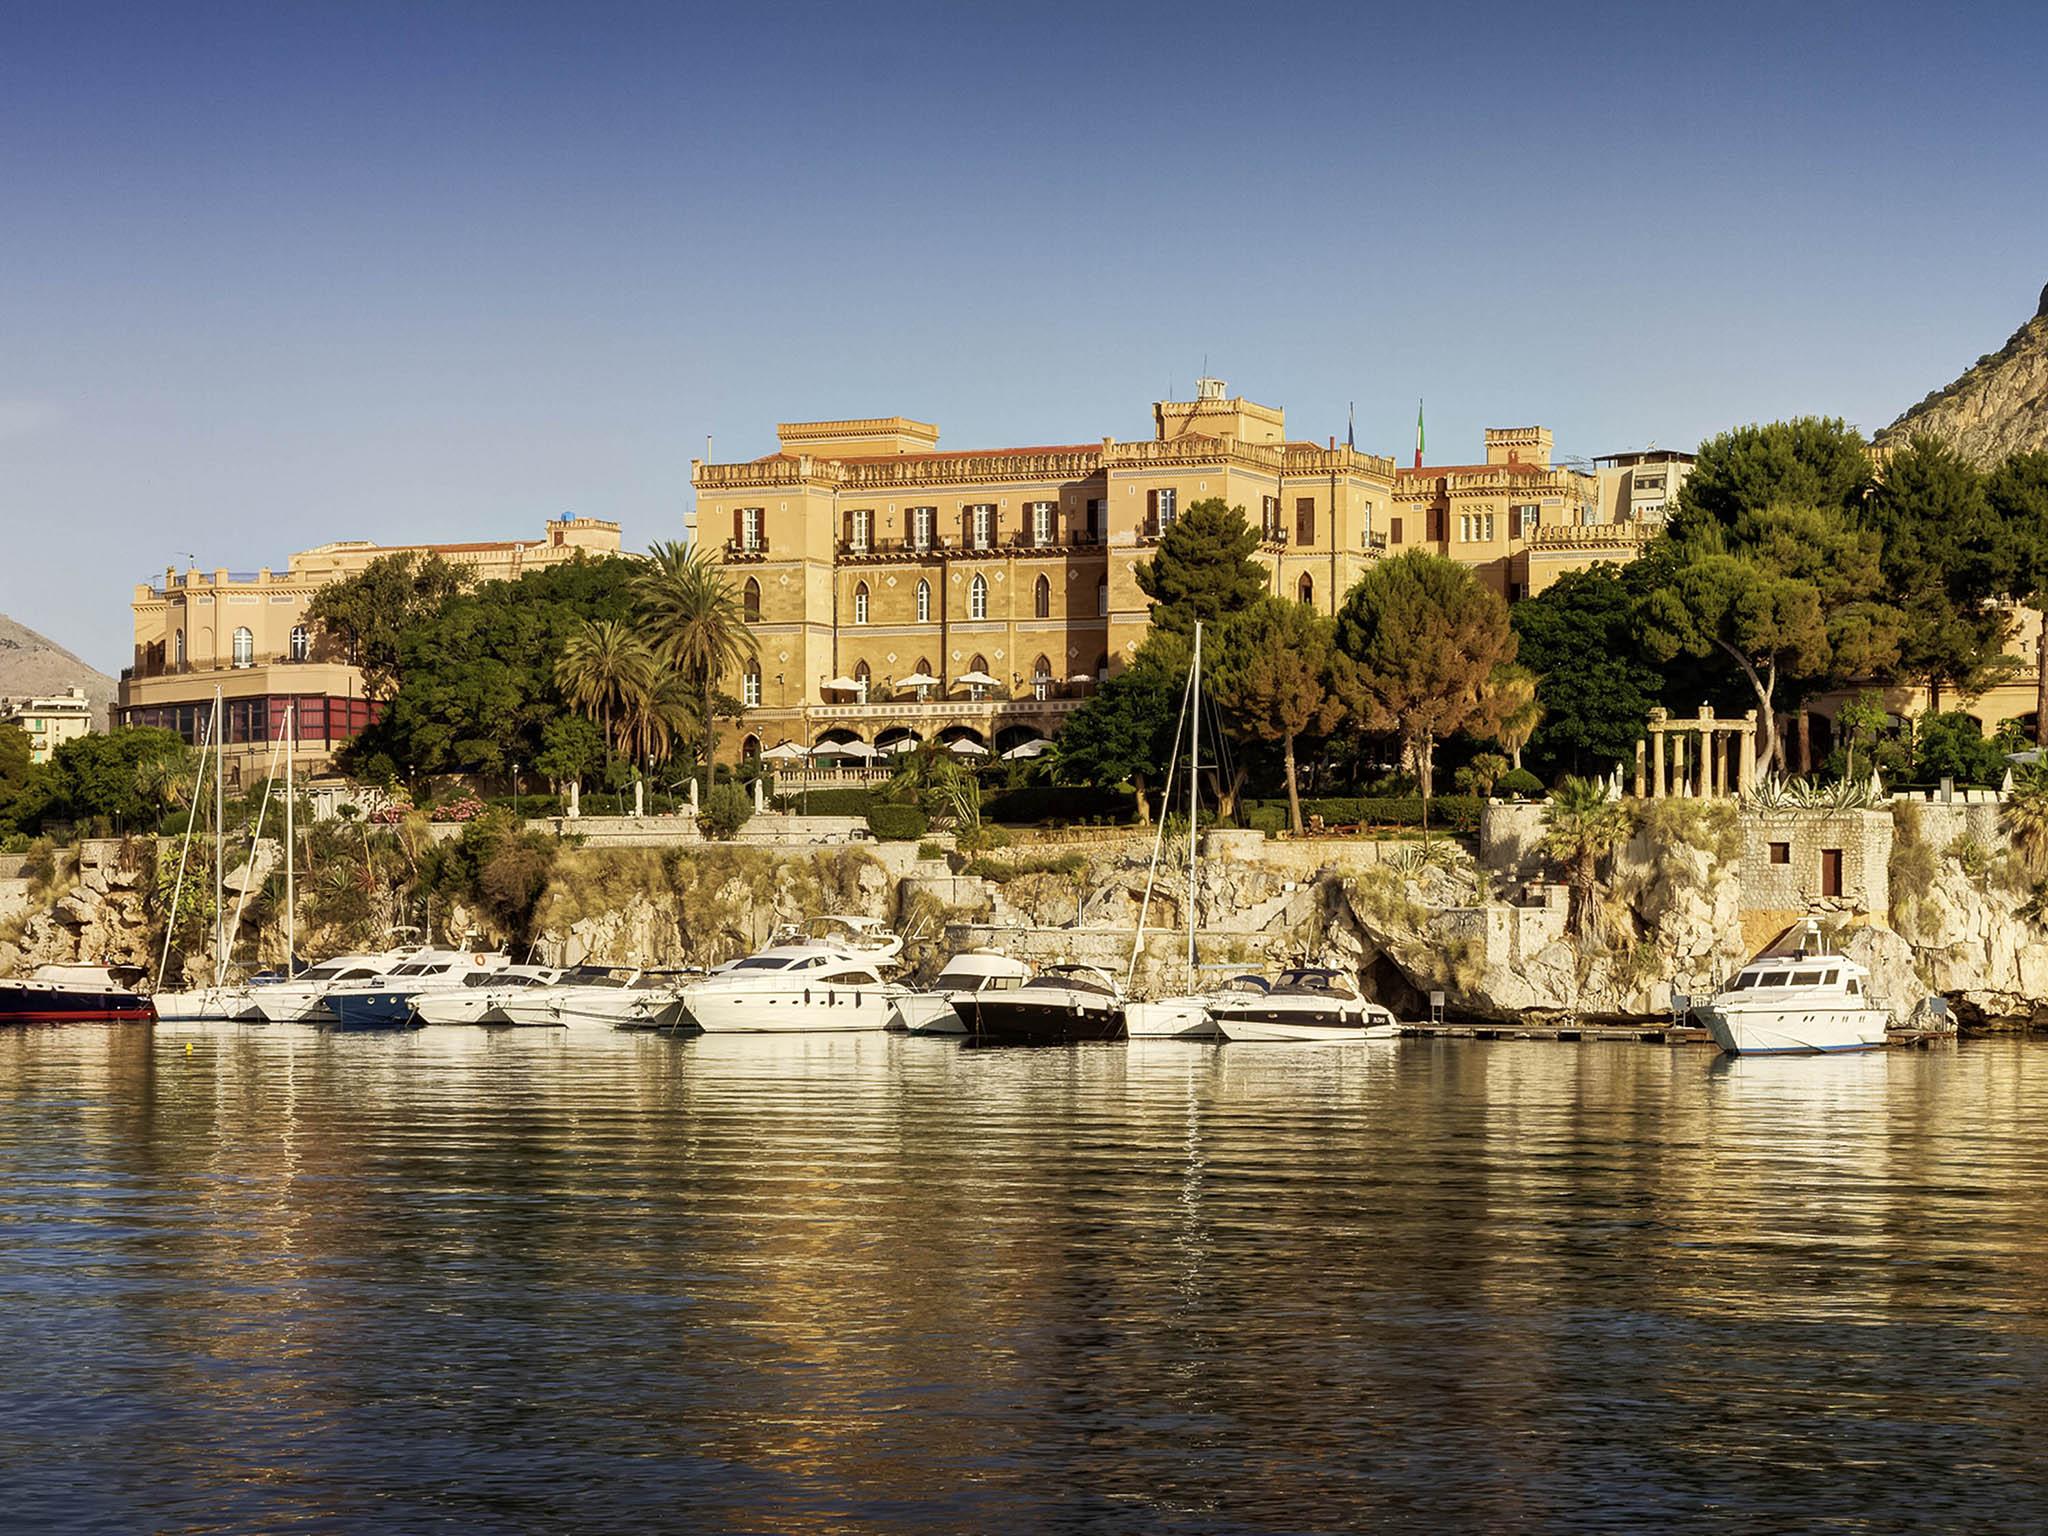 Hotel Grand Villa Igiea Palermo Mgallery By Sofitel